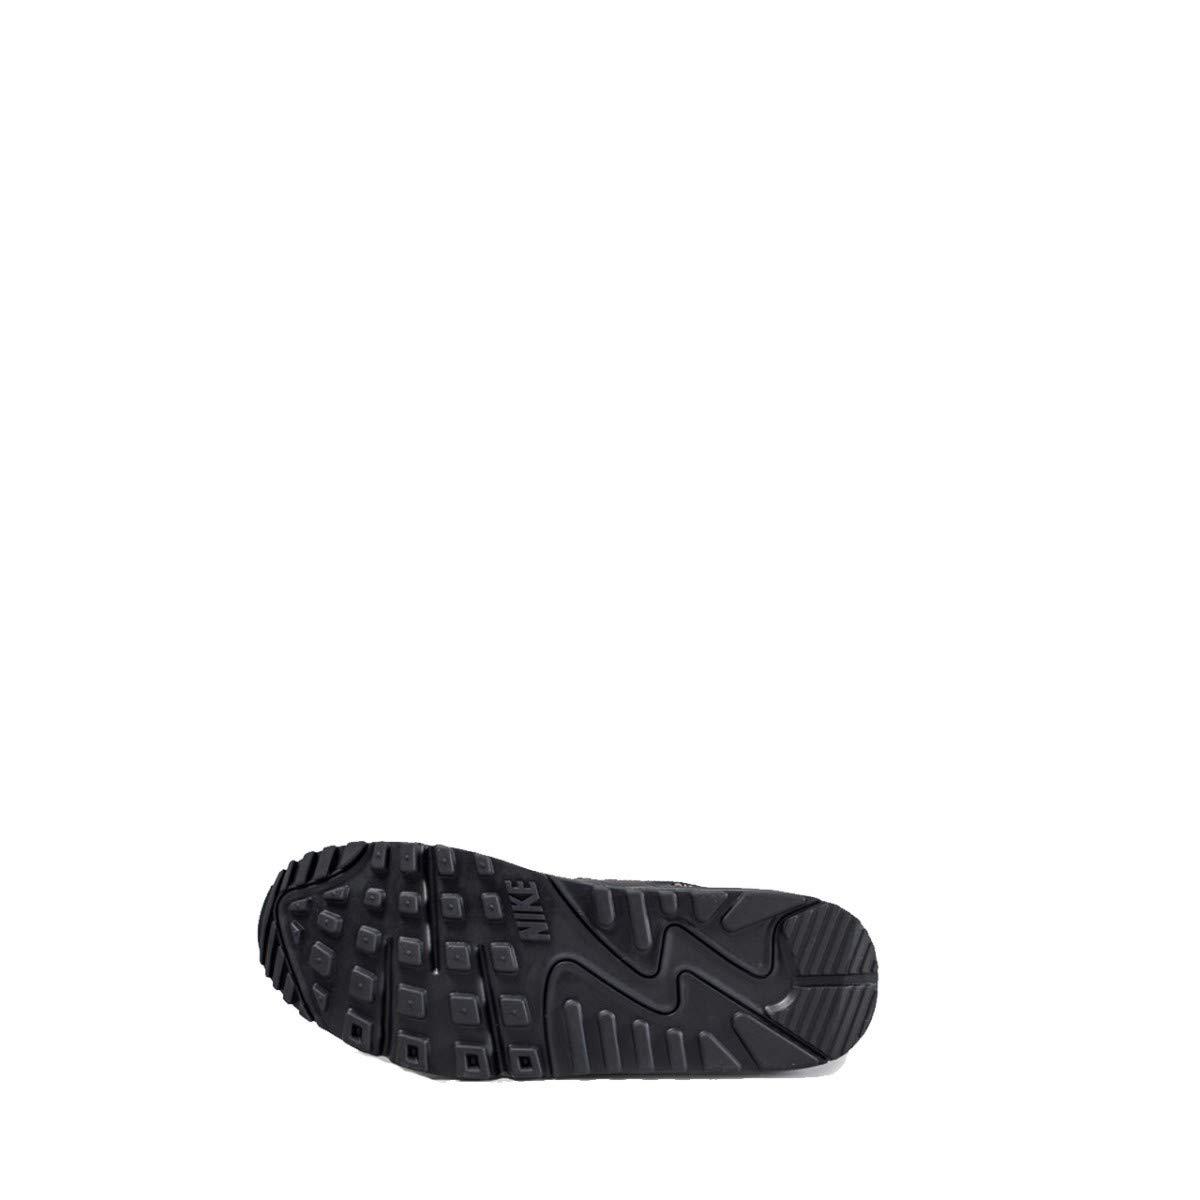 huge discount 7b977 c0da1 Nike Baskets Air Max 90 PRM - Ref. 700155-011  Amazon.fr  Chaussures et Sacs